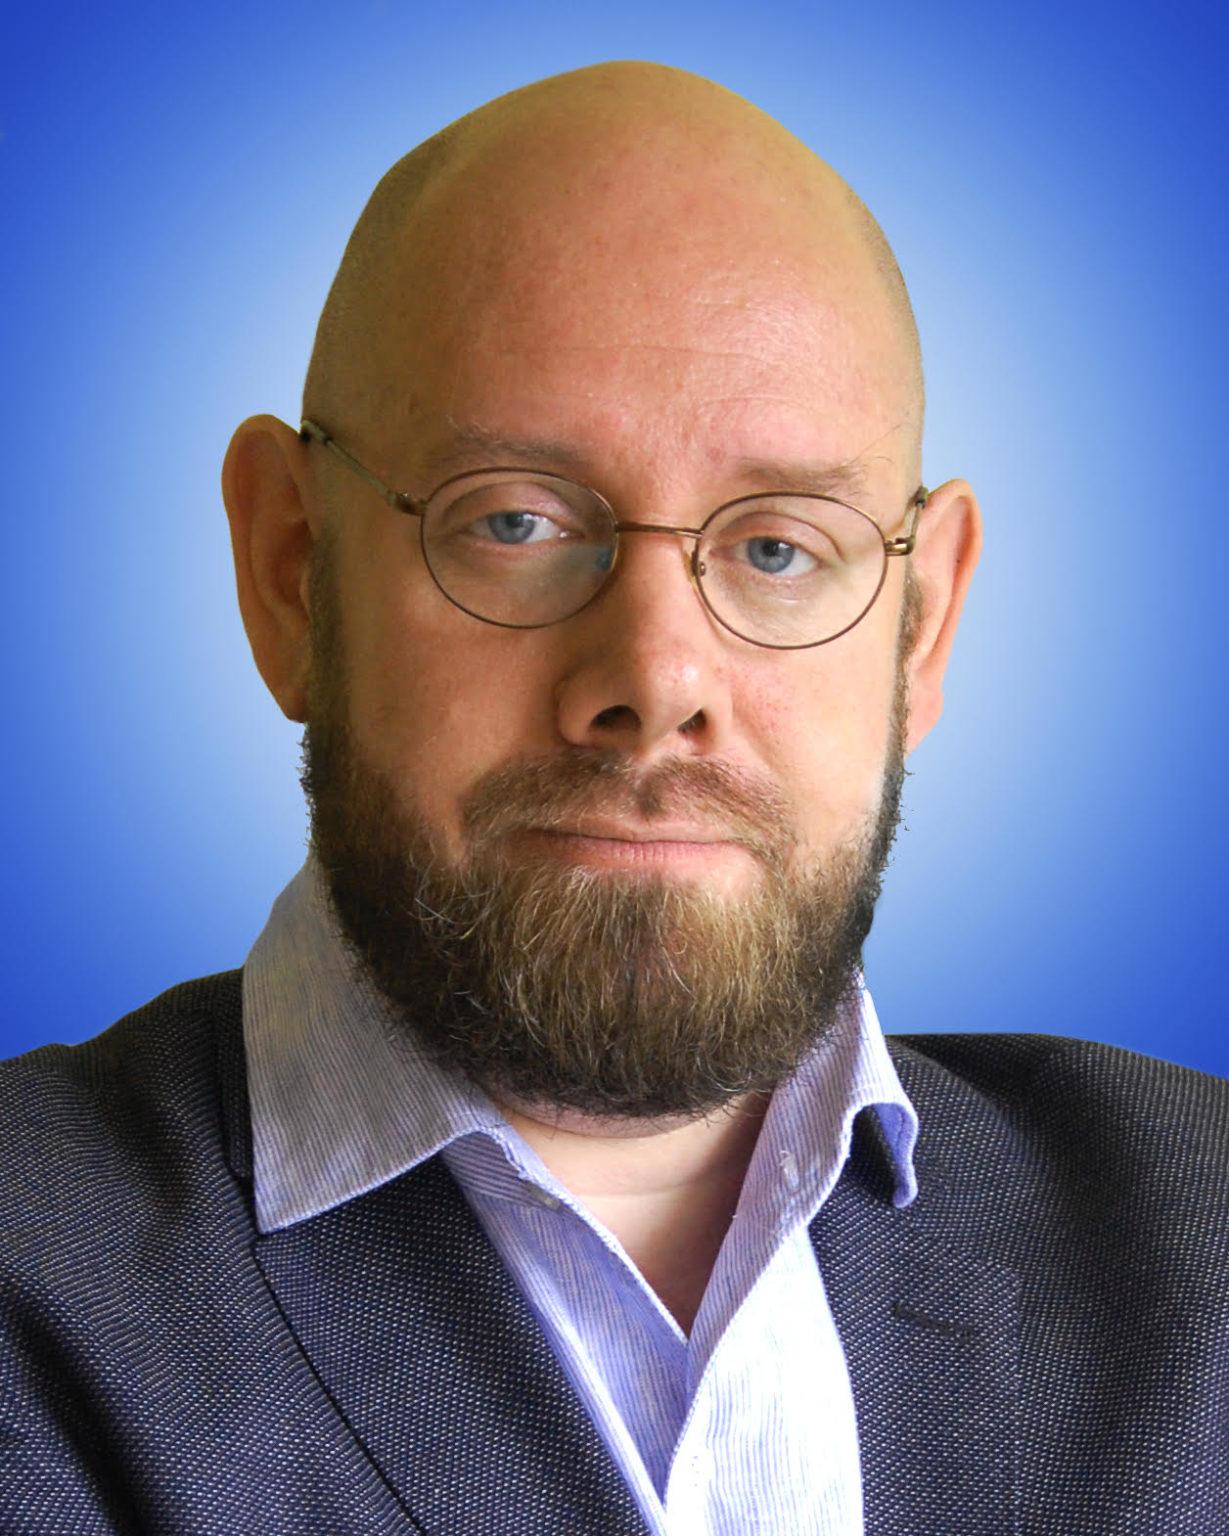 Alex-Krishtop